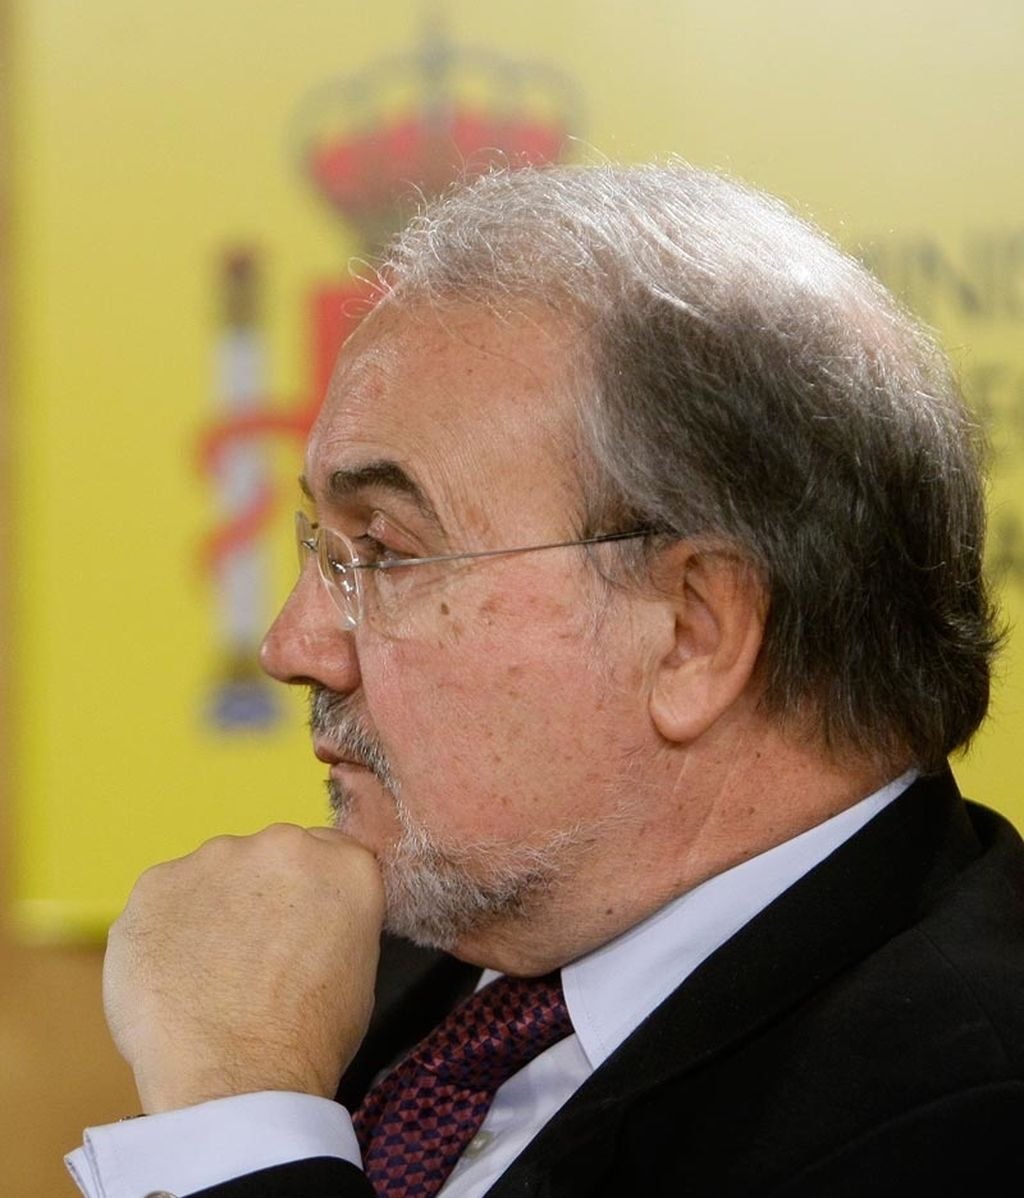 Pedro Solbes - Ministro de Economía